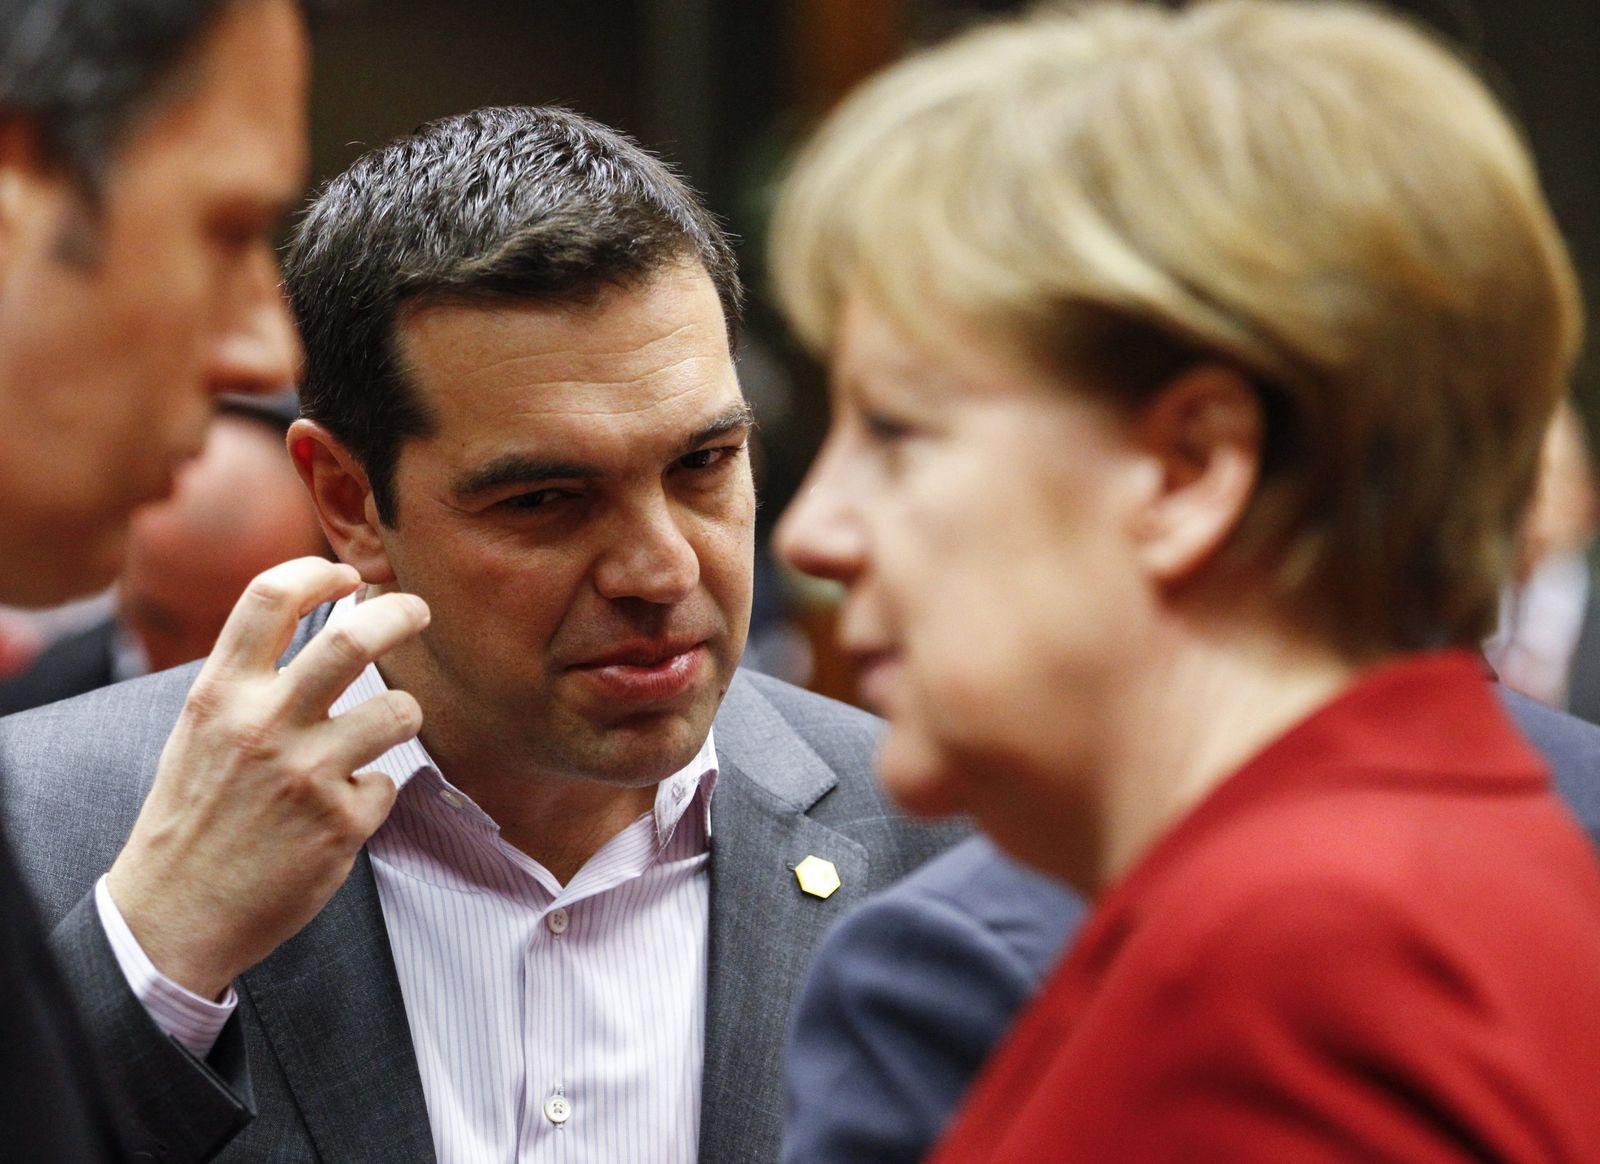 Alexis Tsipras/Angela Merkel